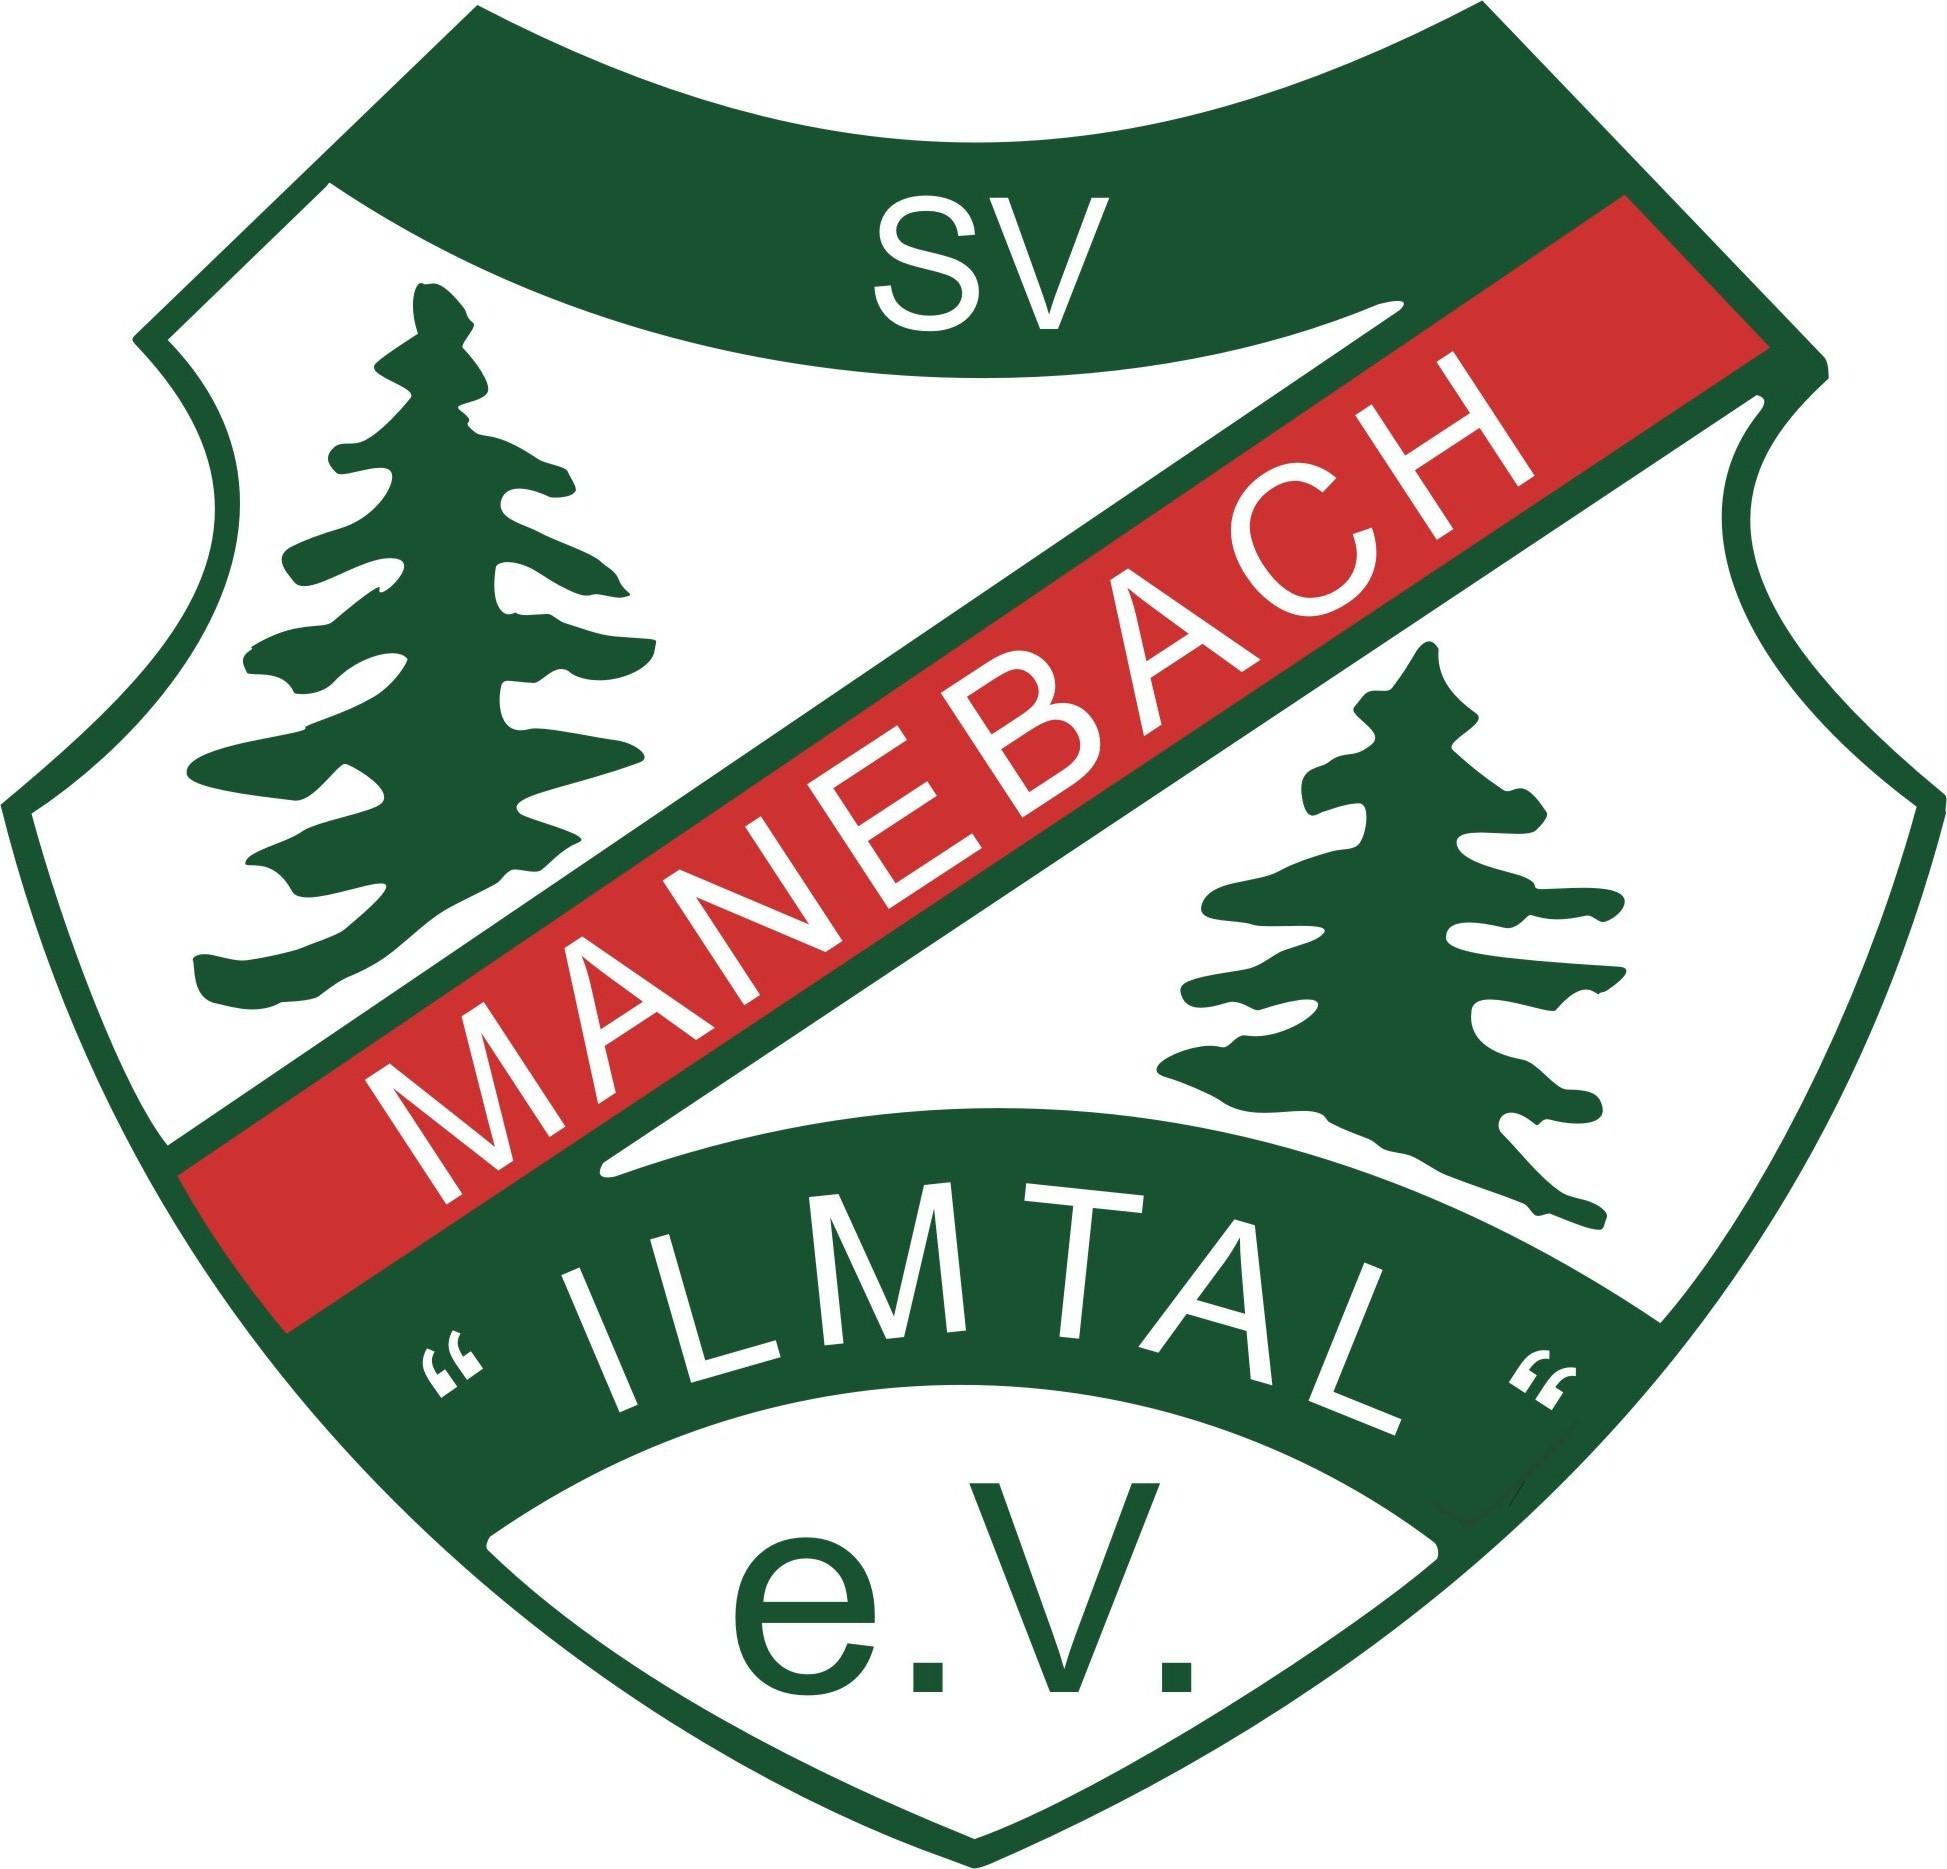 Wappen / Logo des Teams SV Ilmtal Manebach 2